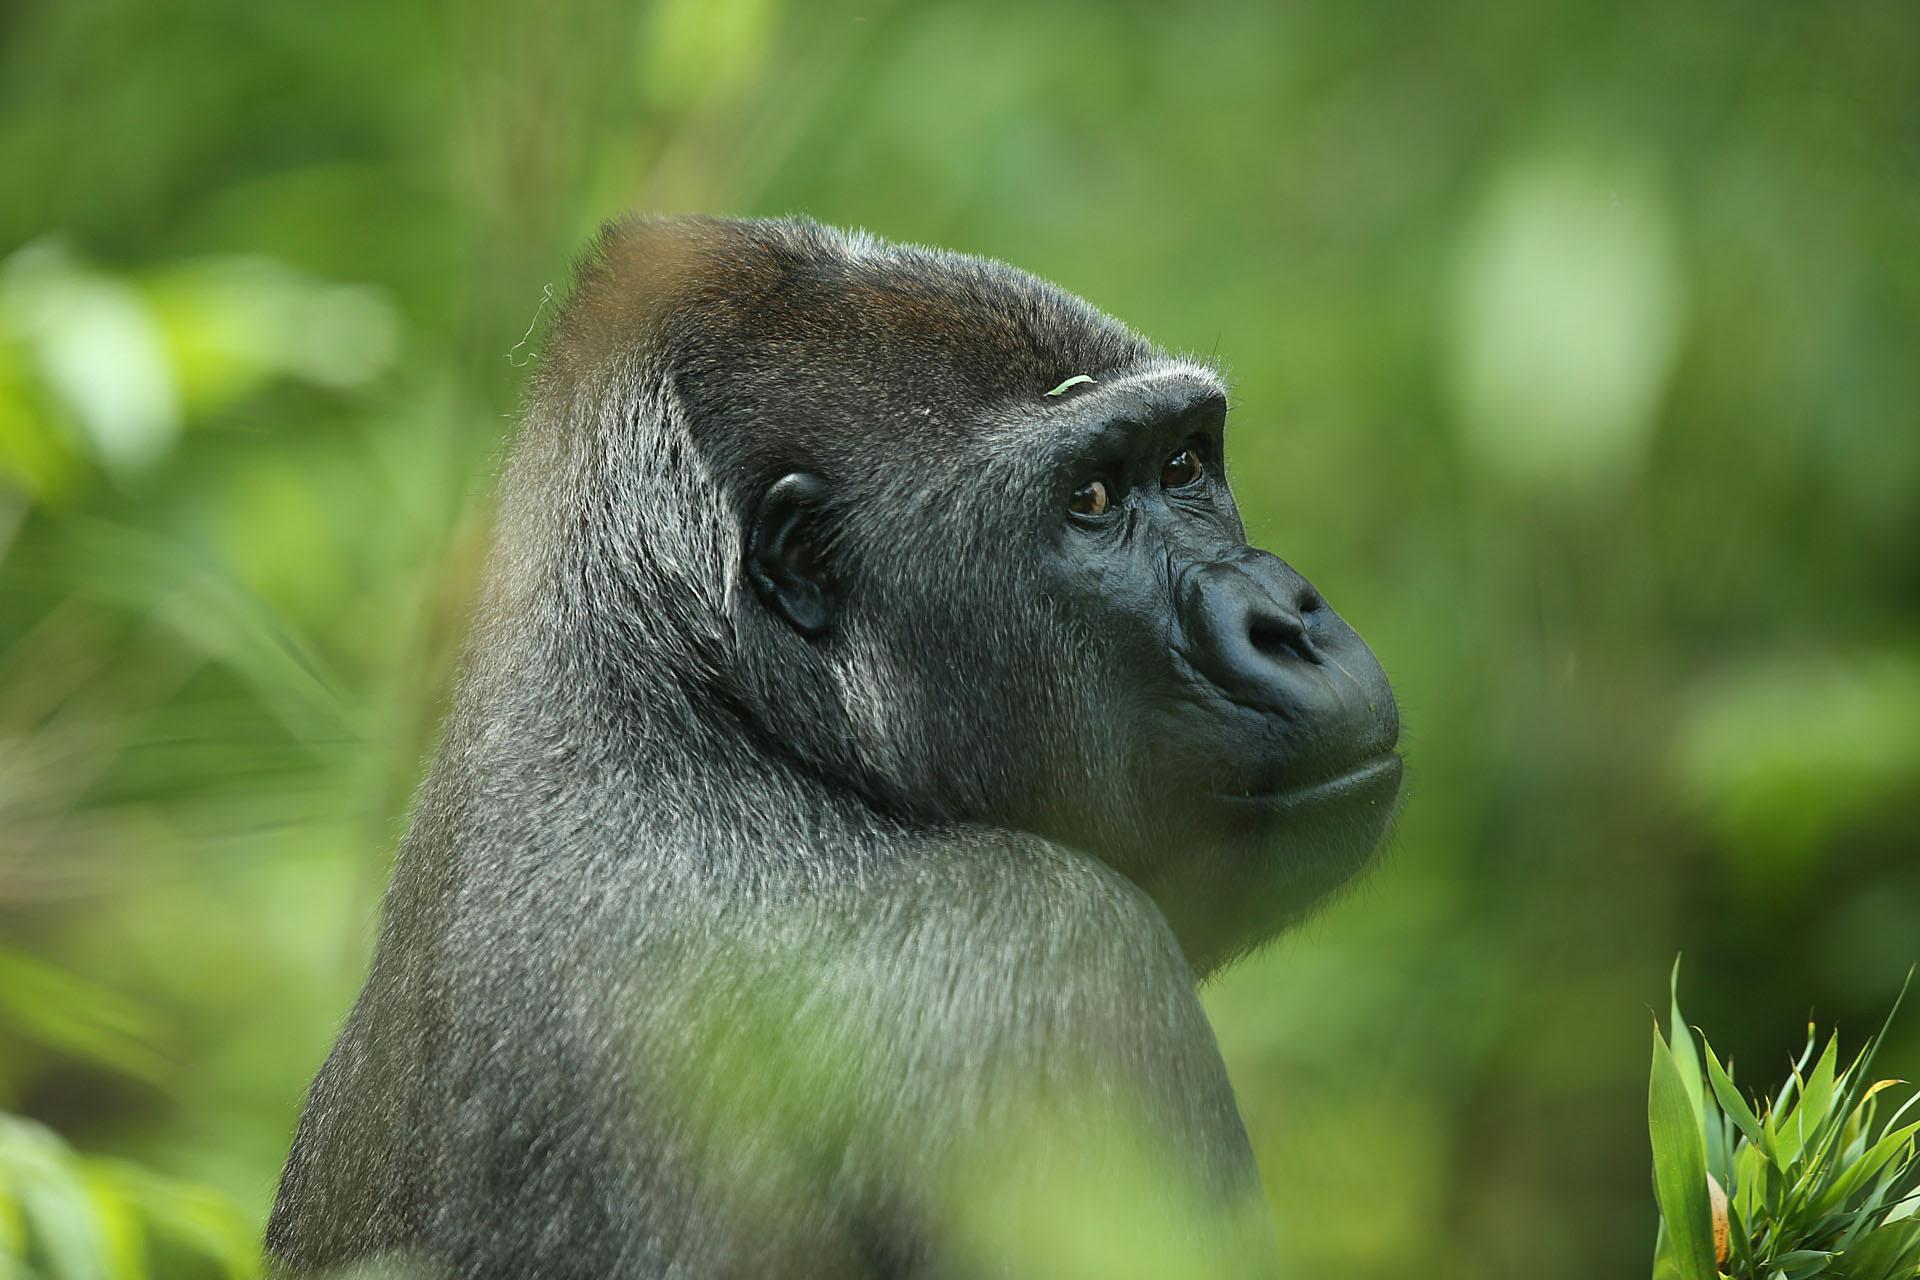 Fotoworkshop Tierfotografie – Ene Besuch im Zoo Kölle